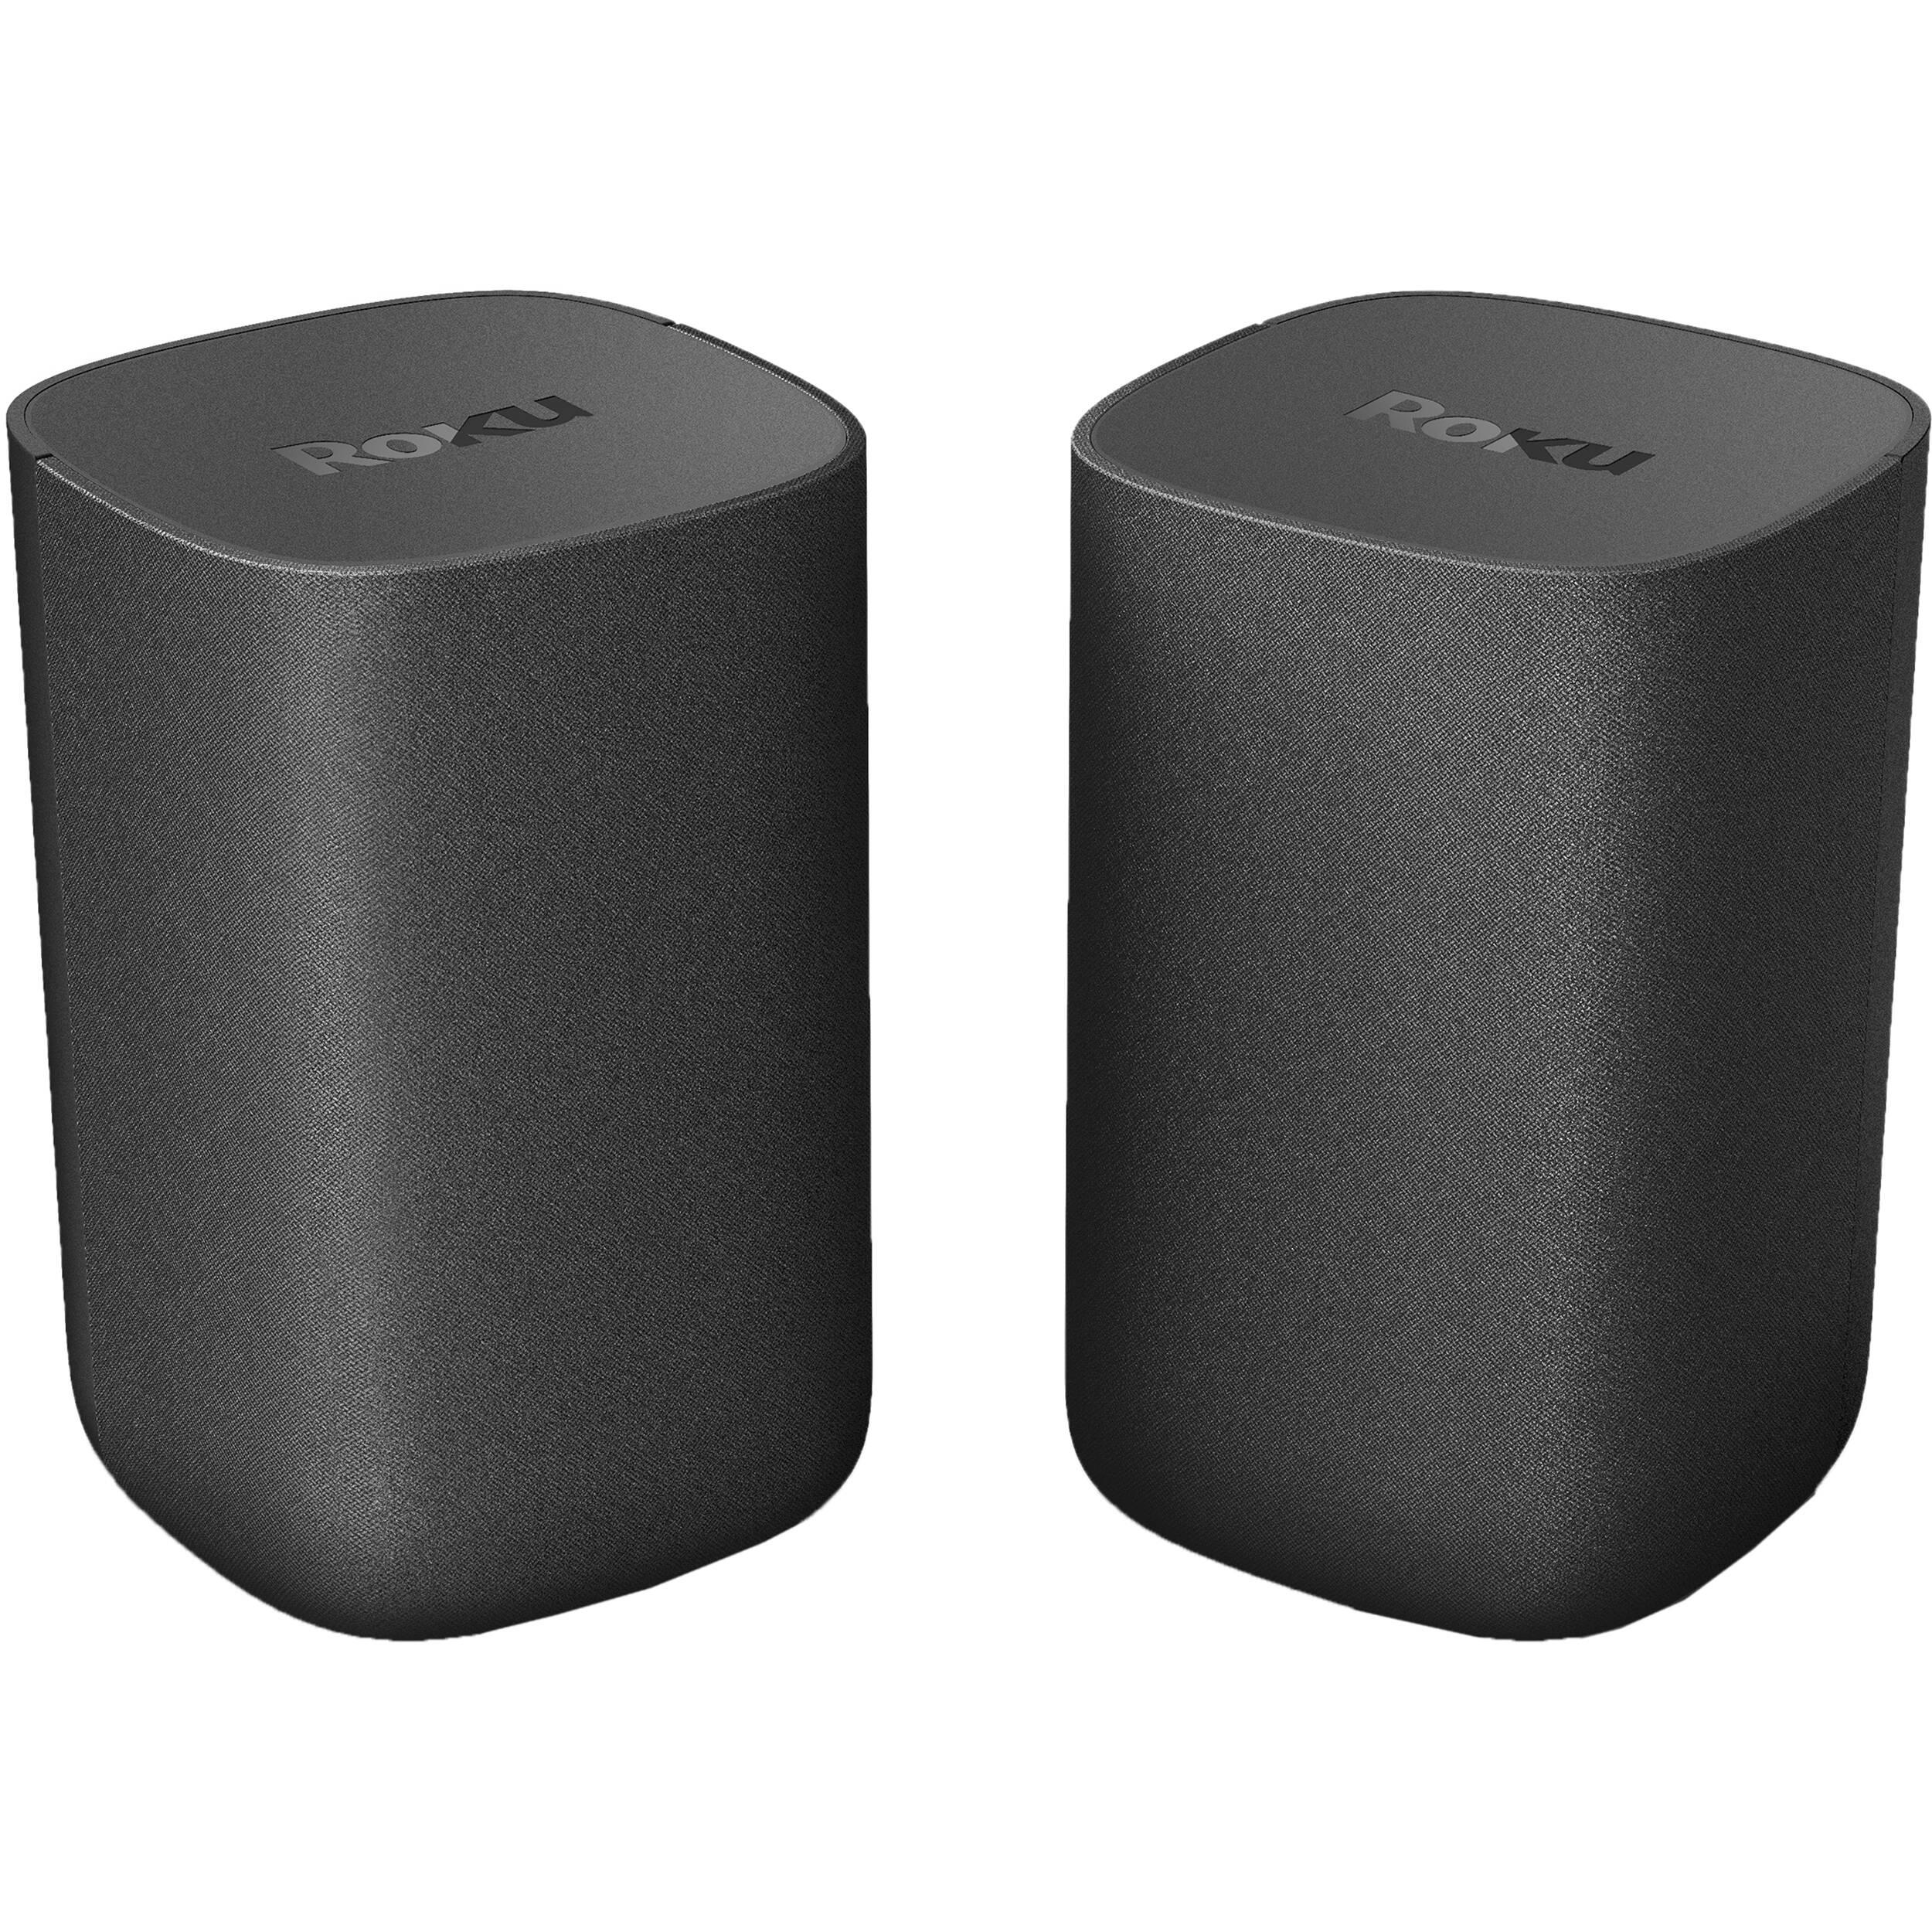 Roku Wireless Speakers (Pair)